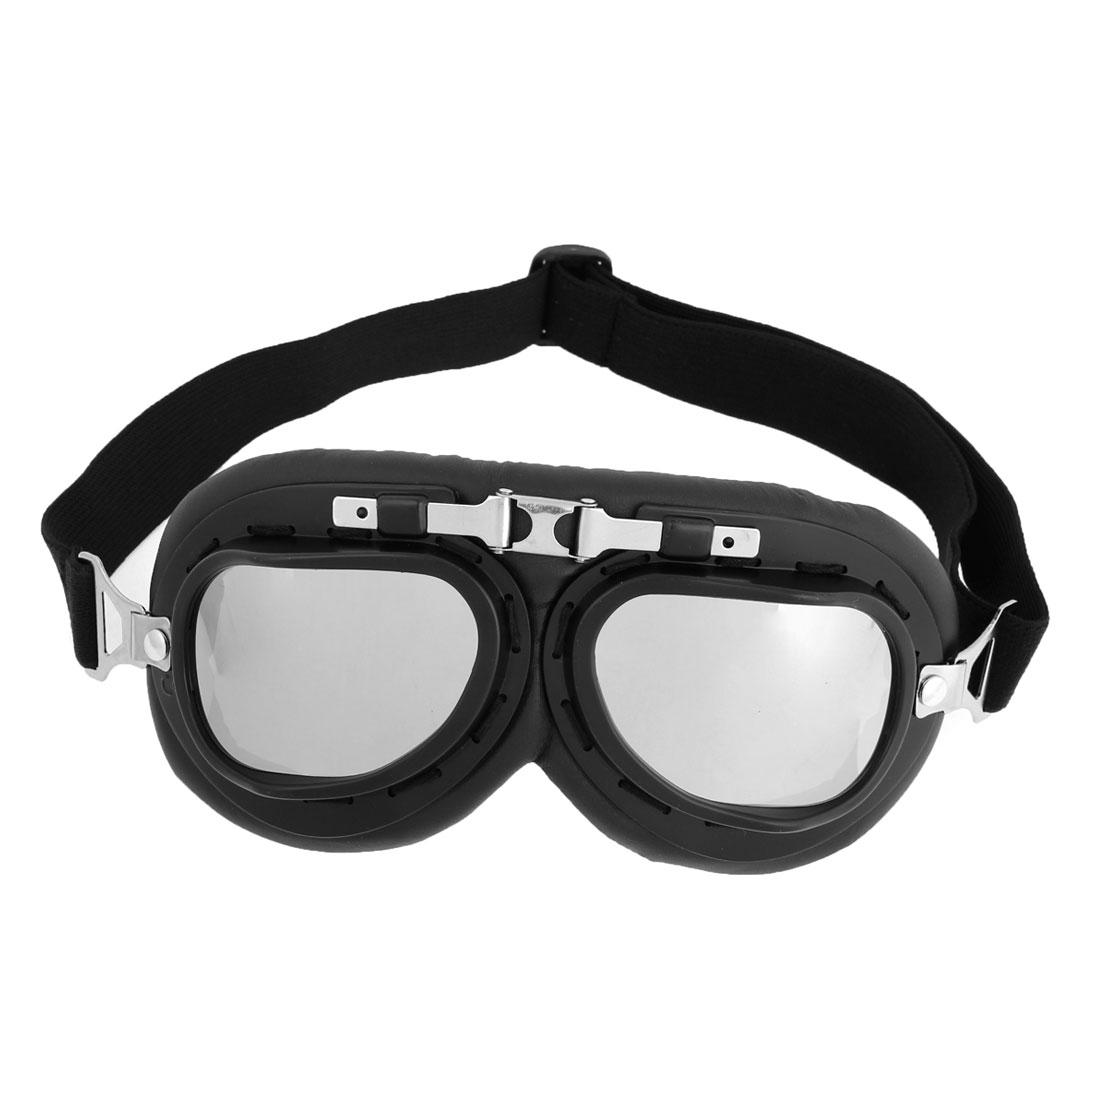 White Lens Skateboard Ski Skiing Goggles Eyewear Protective Glasses Black Rim